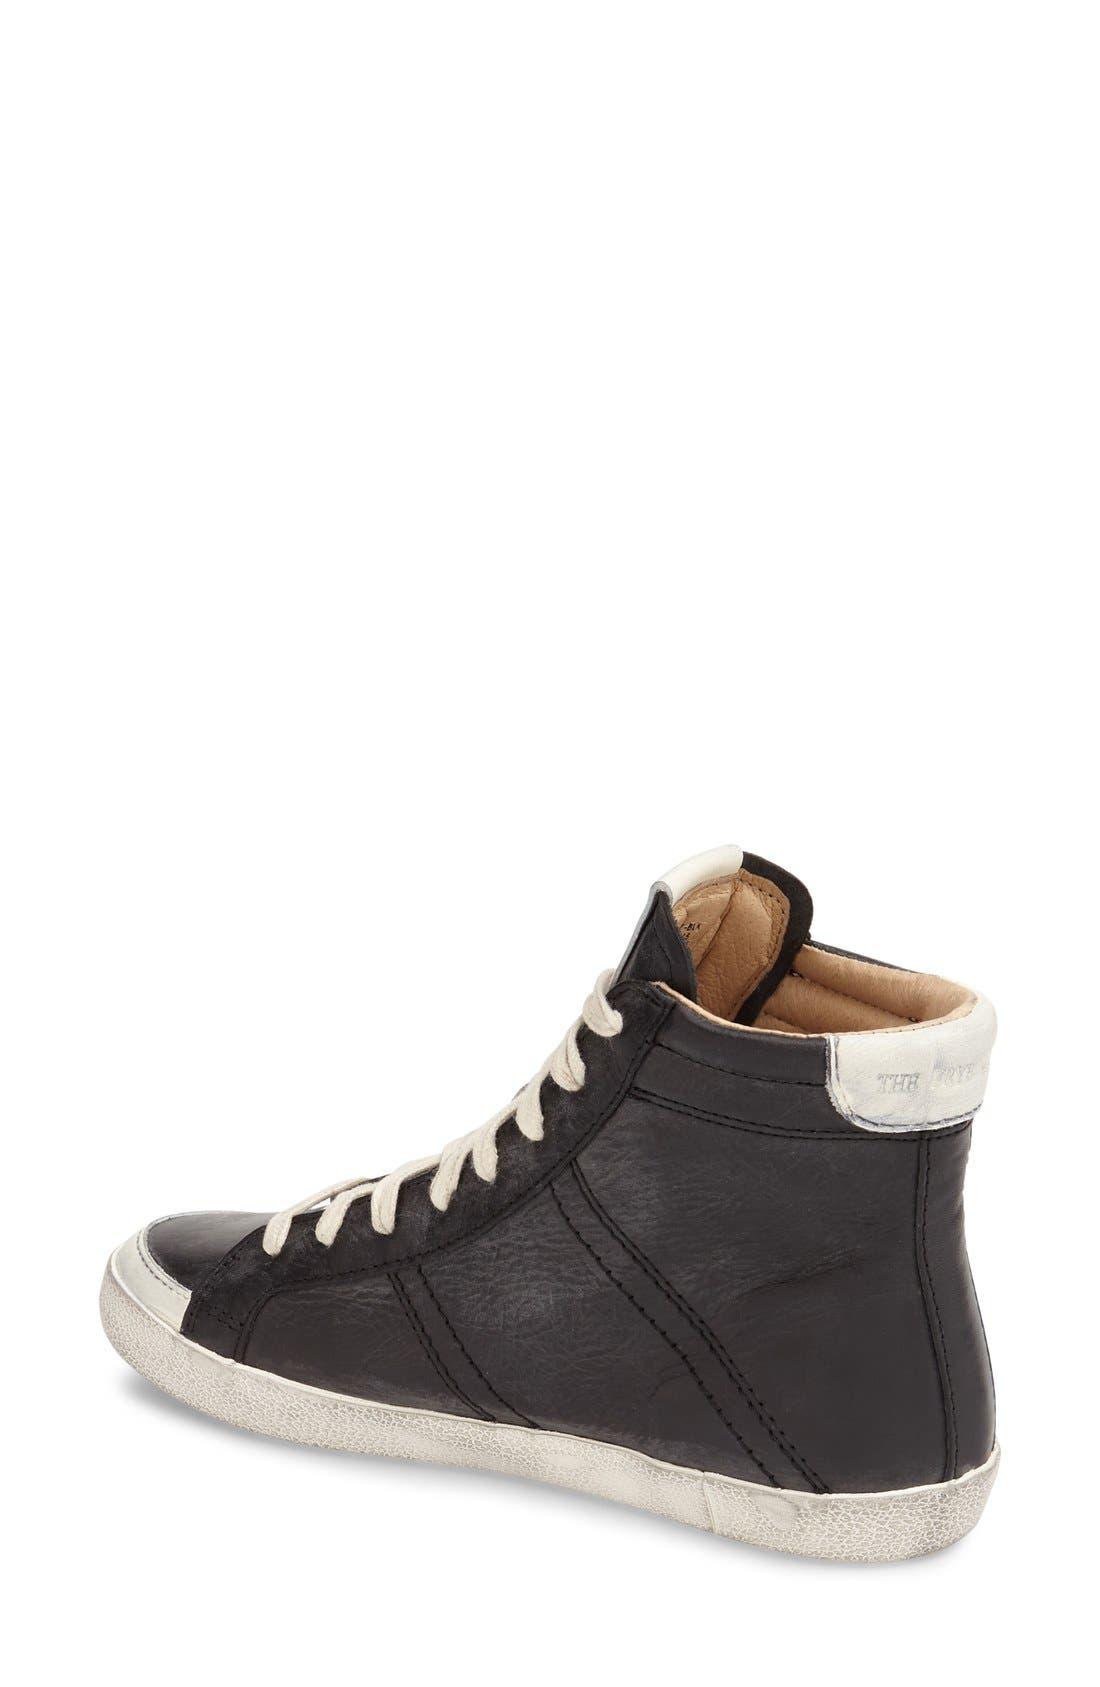 Alternate Image 2  - Frye 'Dylan' High Top Sneaker (Women)